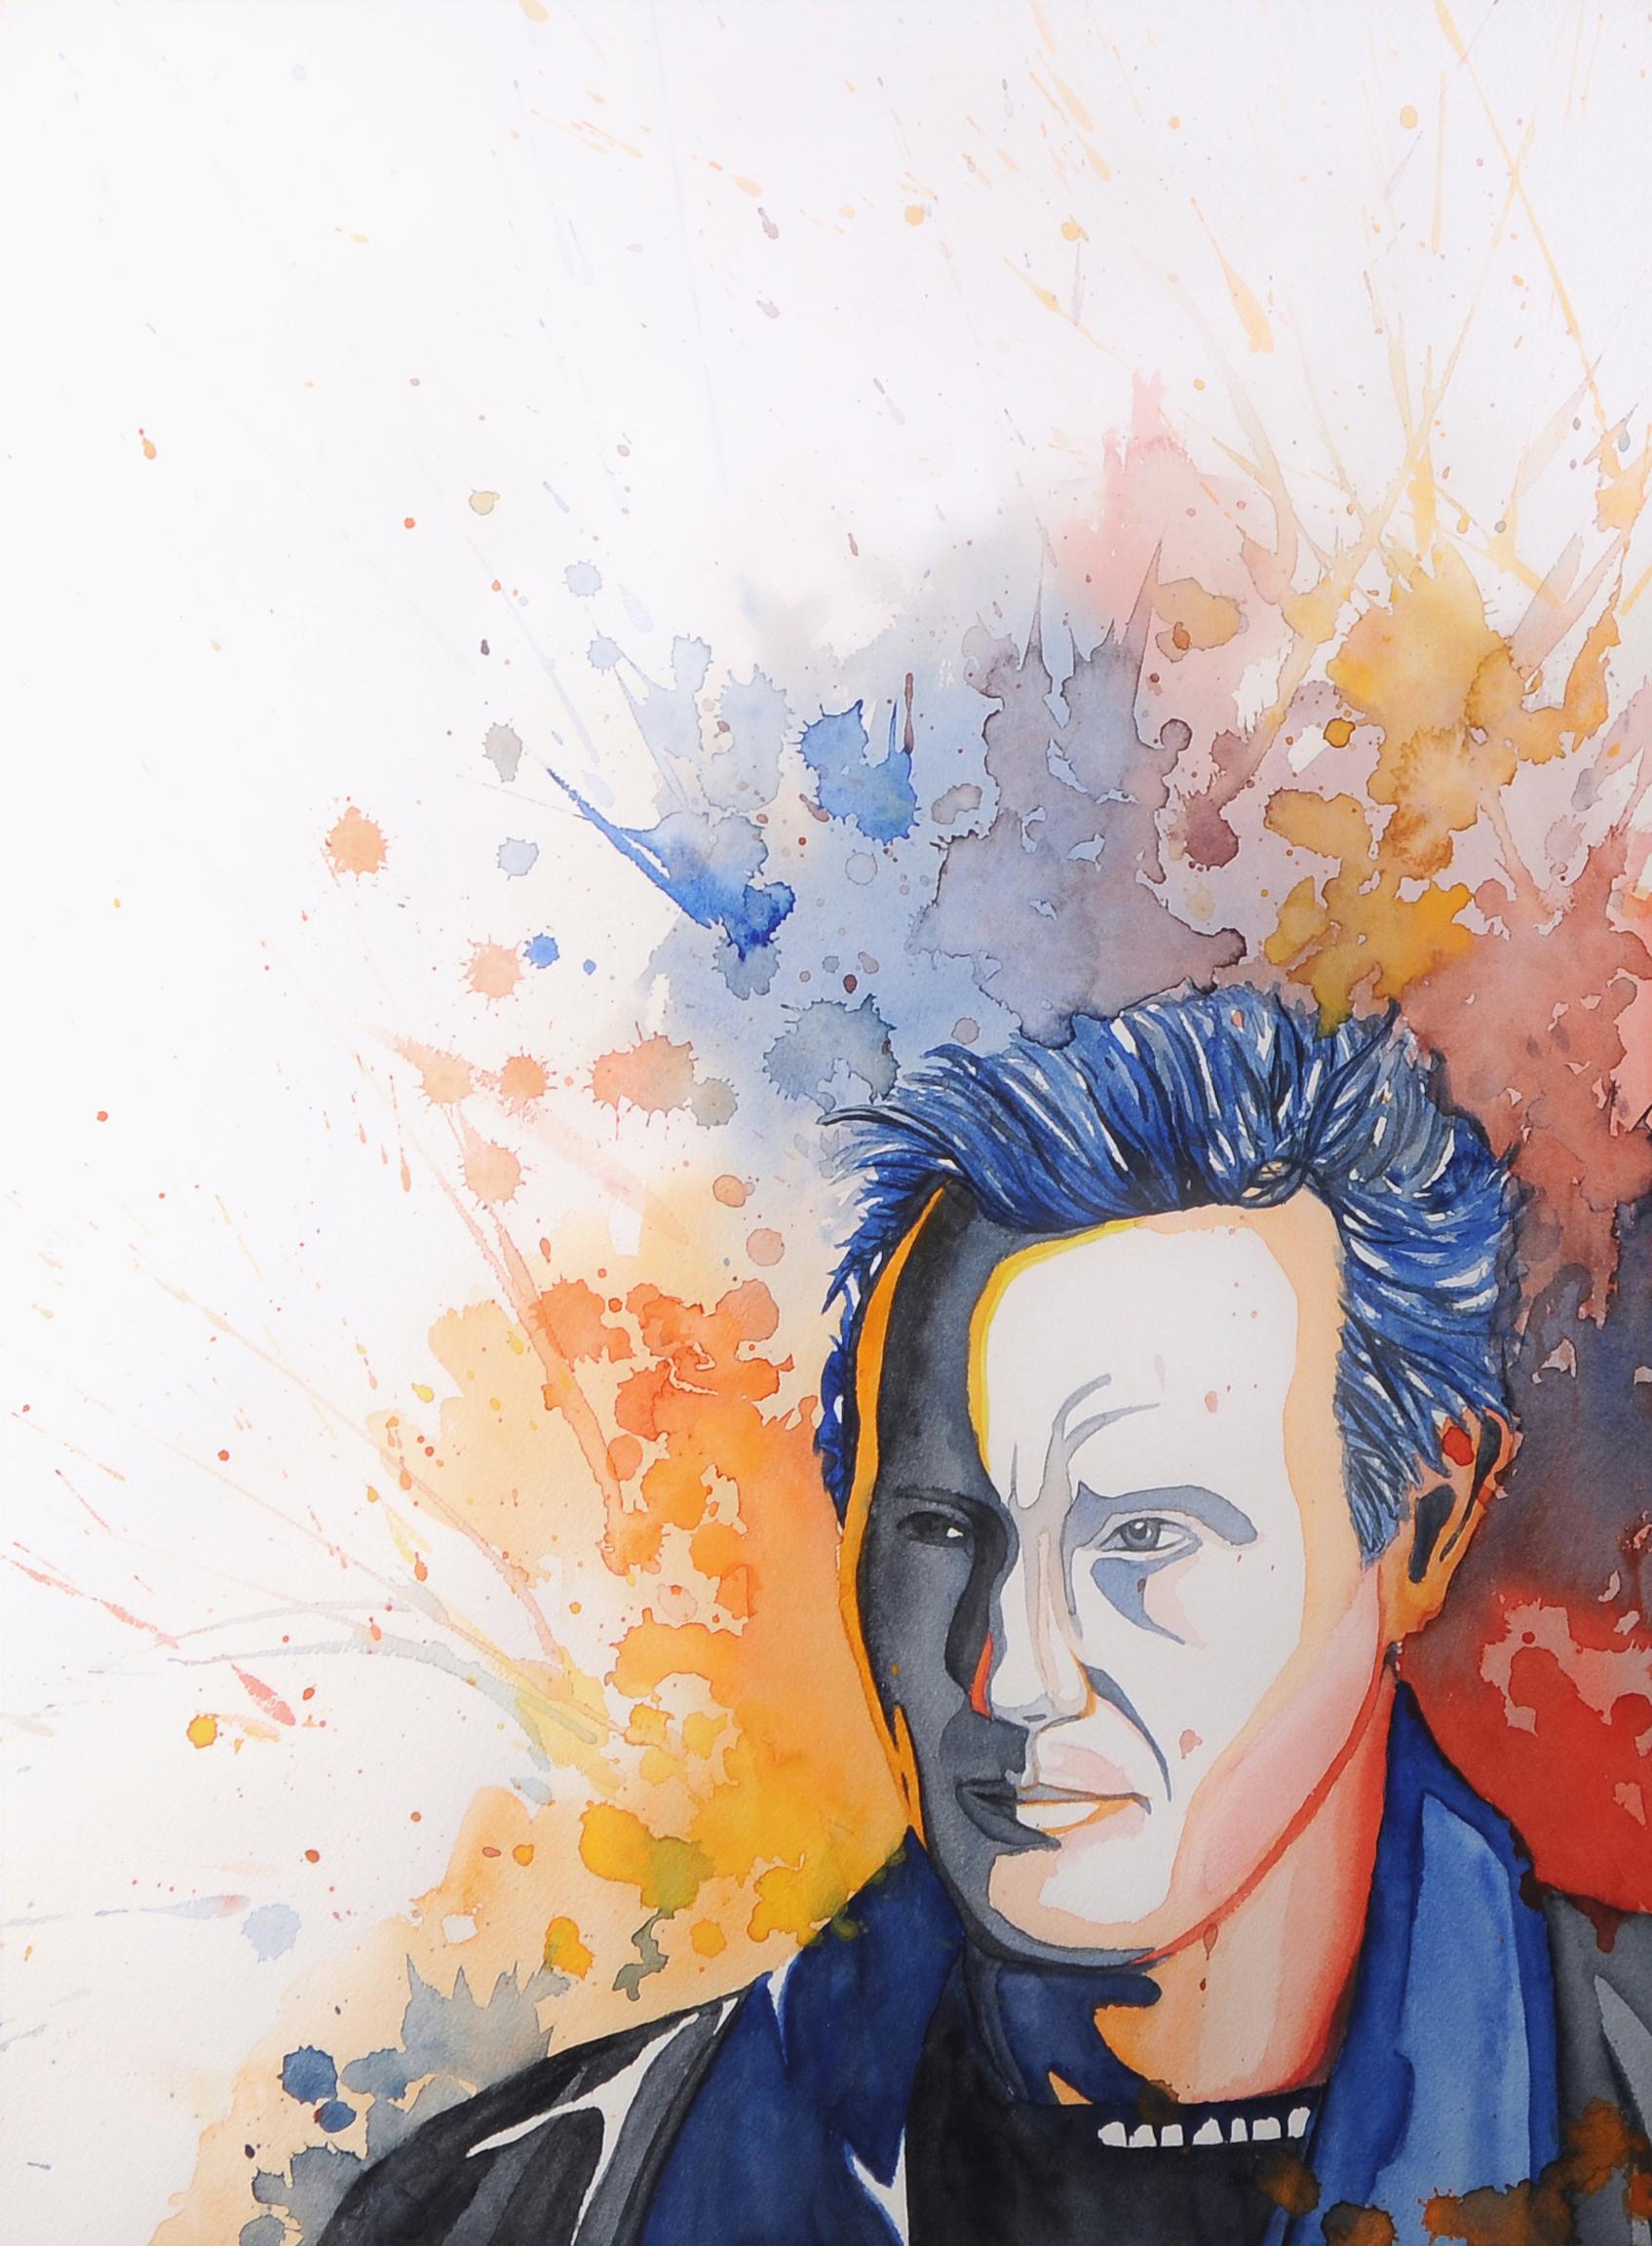 Portrait of Liam Neeson